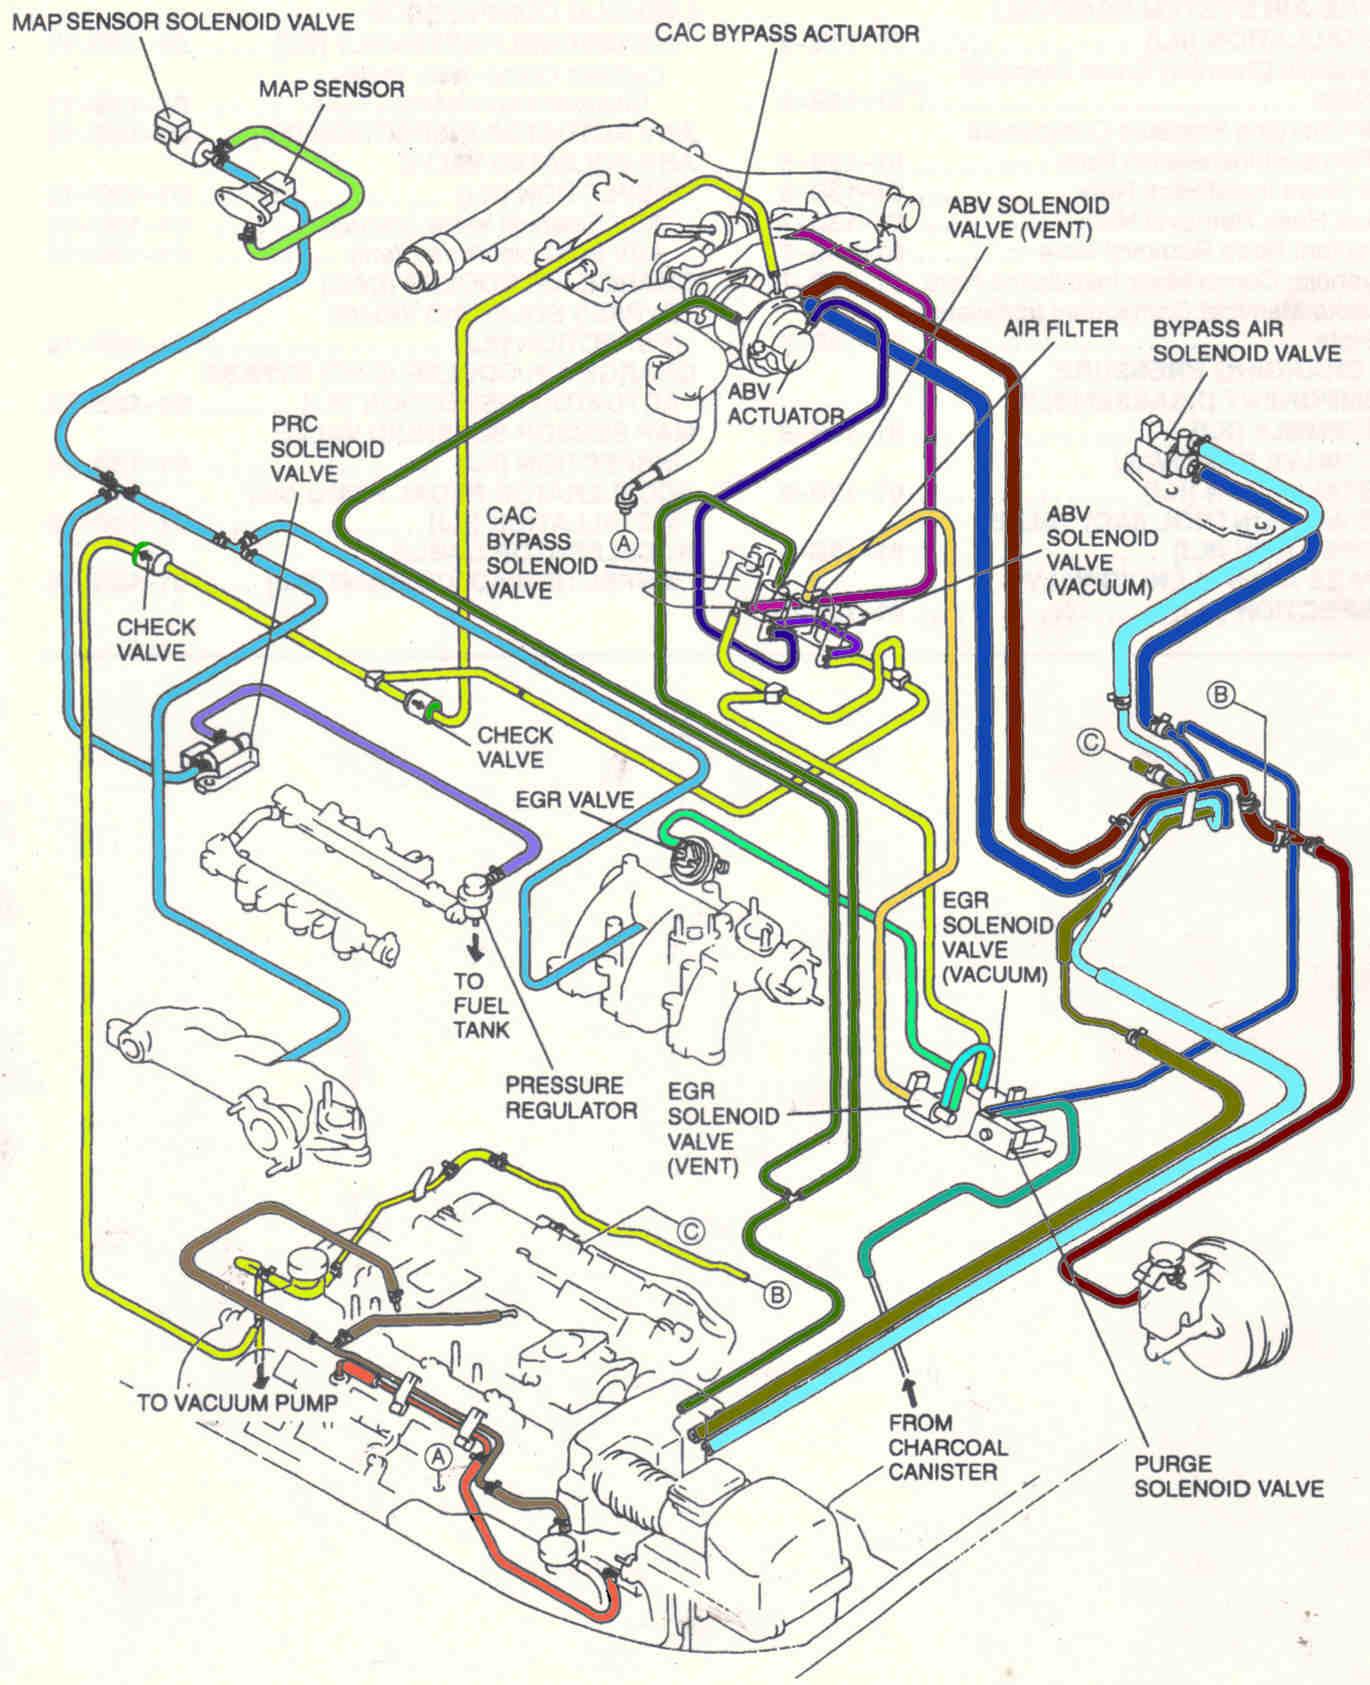 96up kj vachose?resize\\\\\\\=665%2C818 panasonic cn nvd905u wiring diagram wiring diagrams panasonic cn-nvd905u wiring harness at crackthecode.co